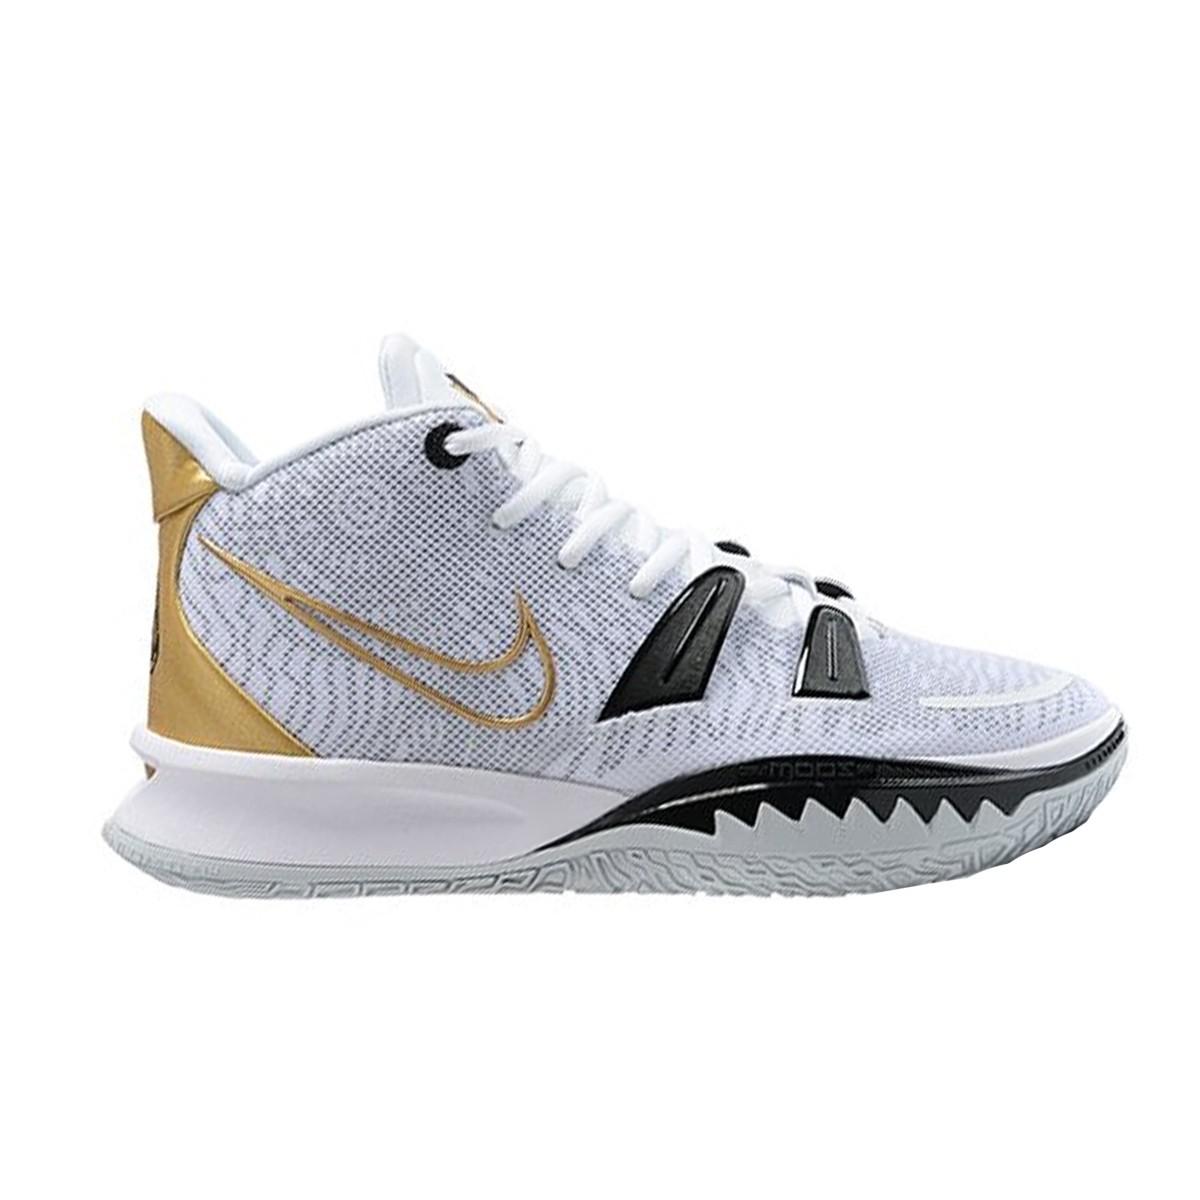 Nike Kyrie 7 Jr 'Gold Ring'